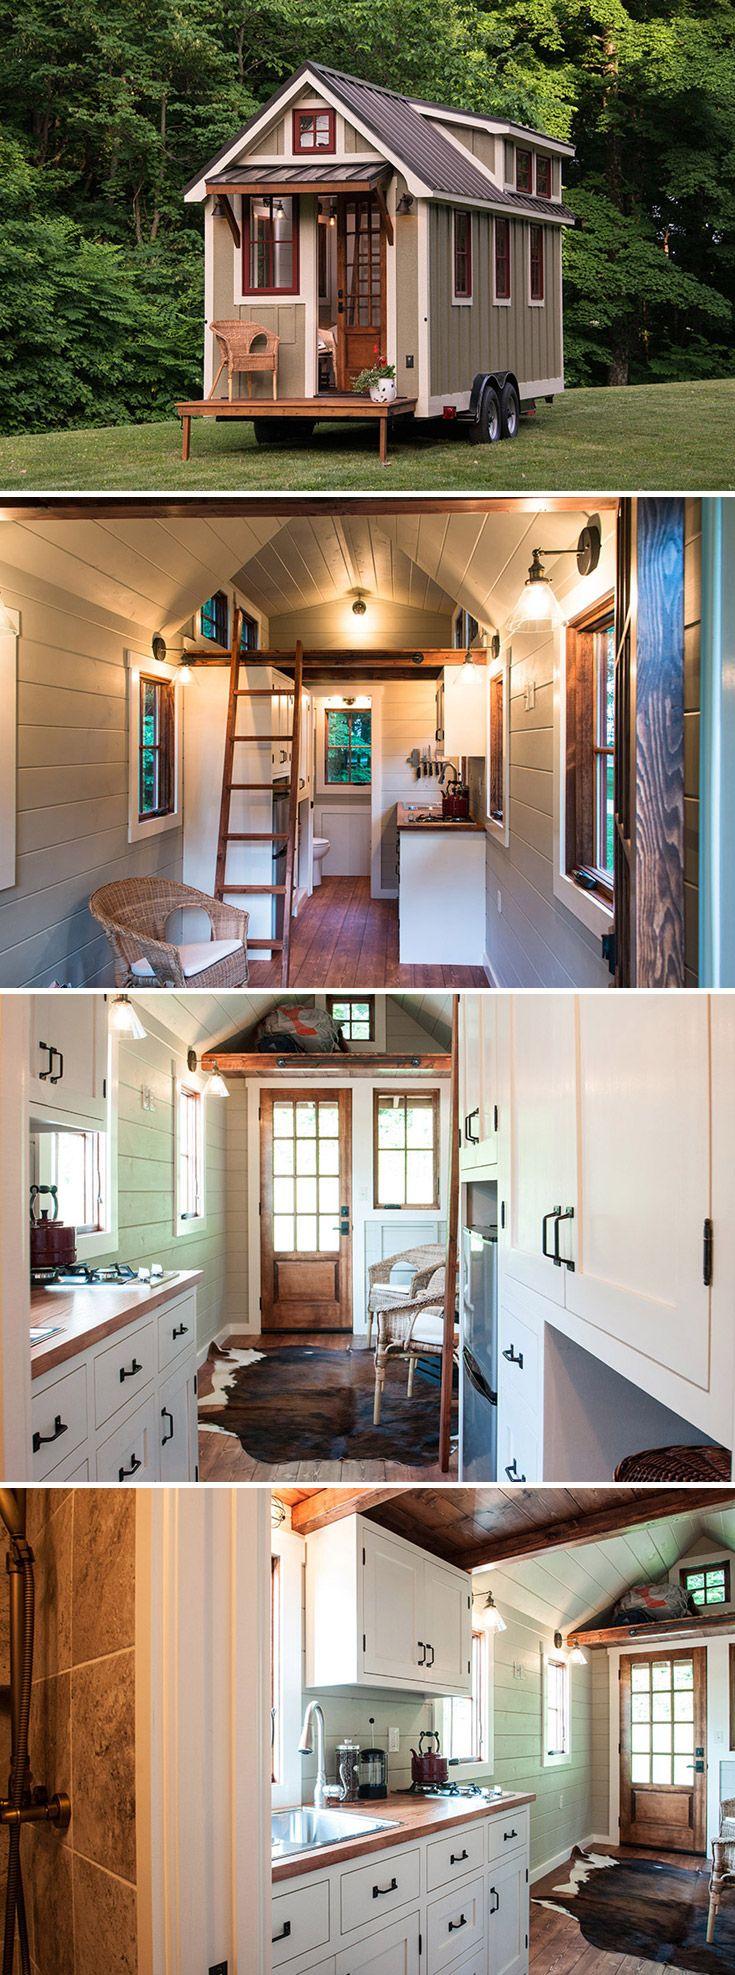 Ynez by timbercraft tiny homes mini maison minis et for Mini maison usinee